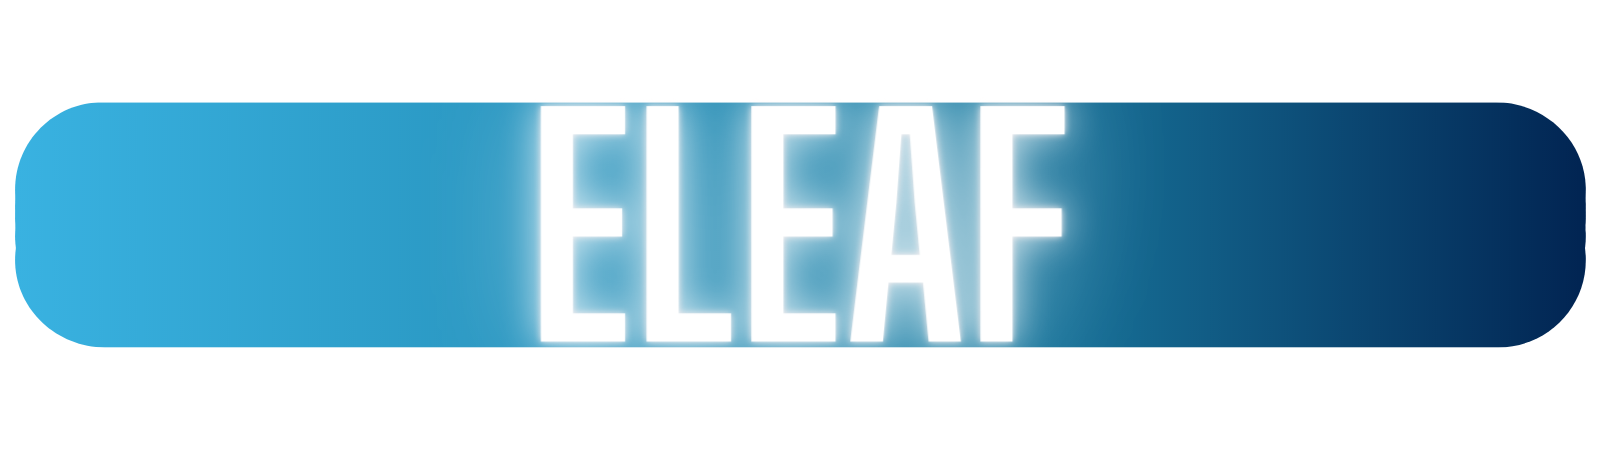 Eleaf Products